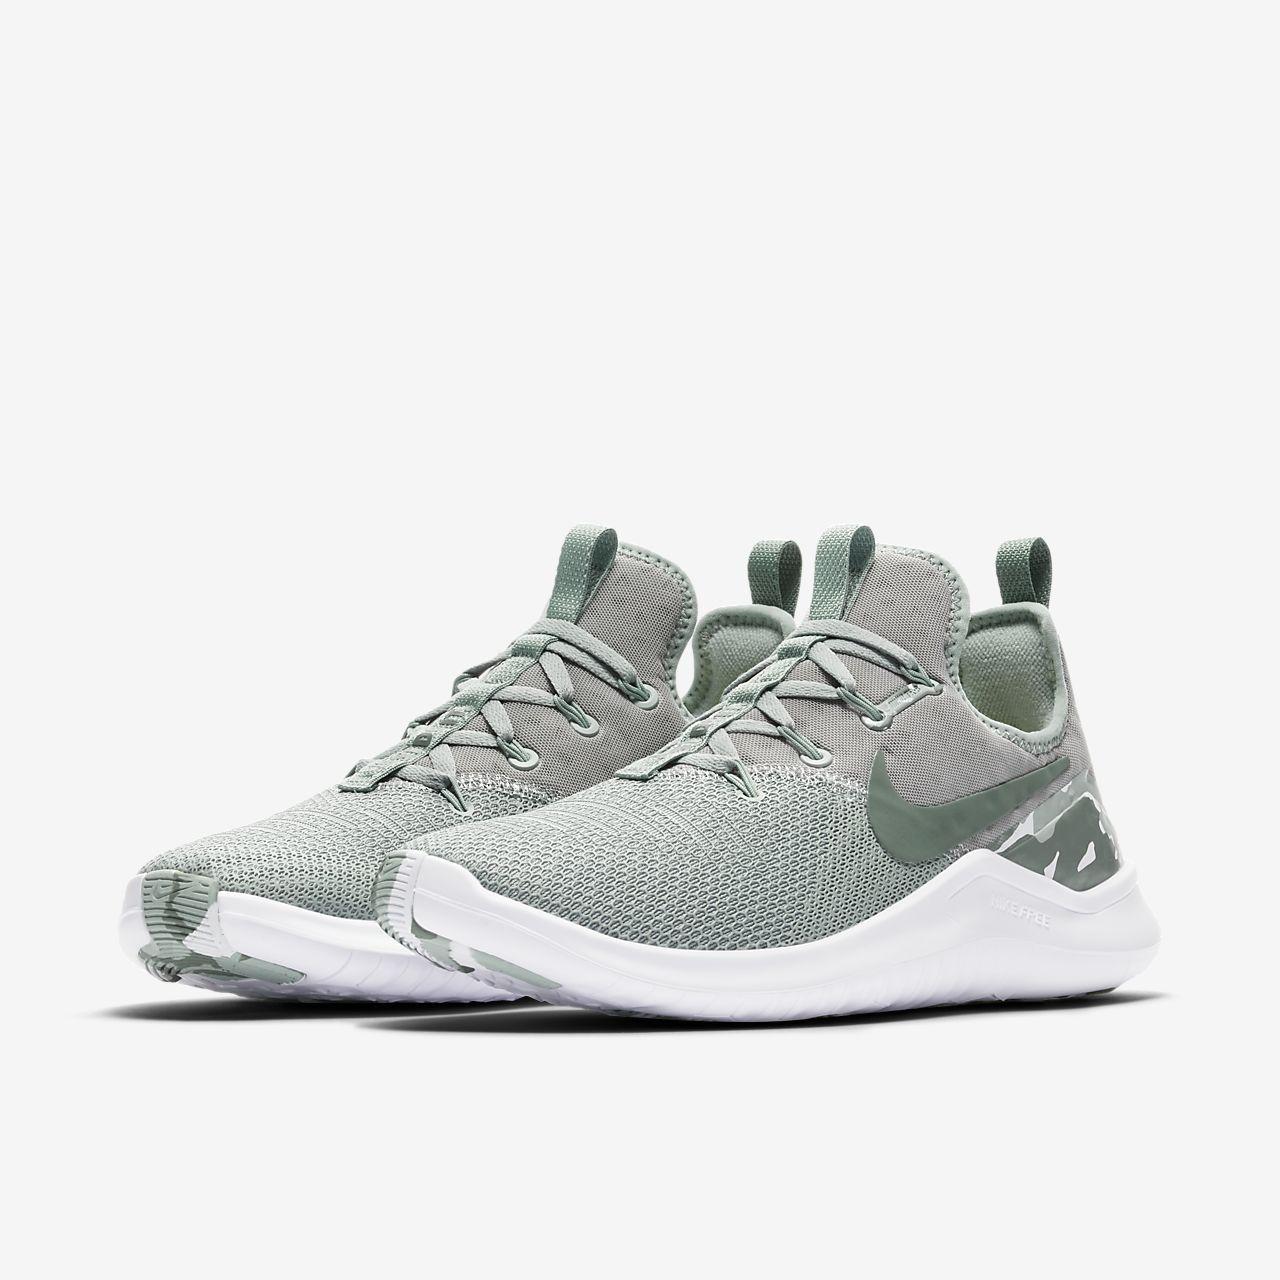 Nike PerformanceFREE TR 8 AMP - Sports shoes - light pumice/clay green pqz0I600V